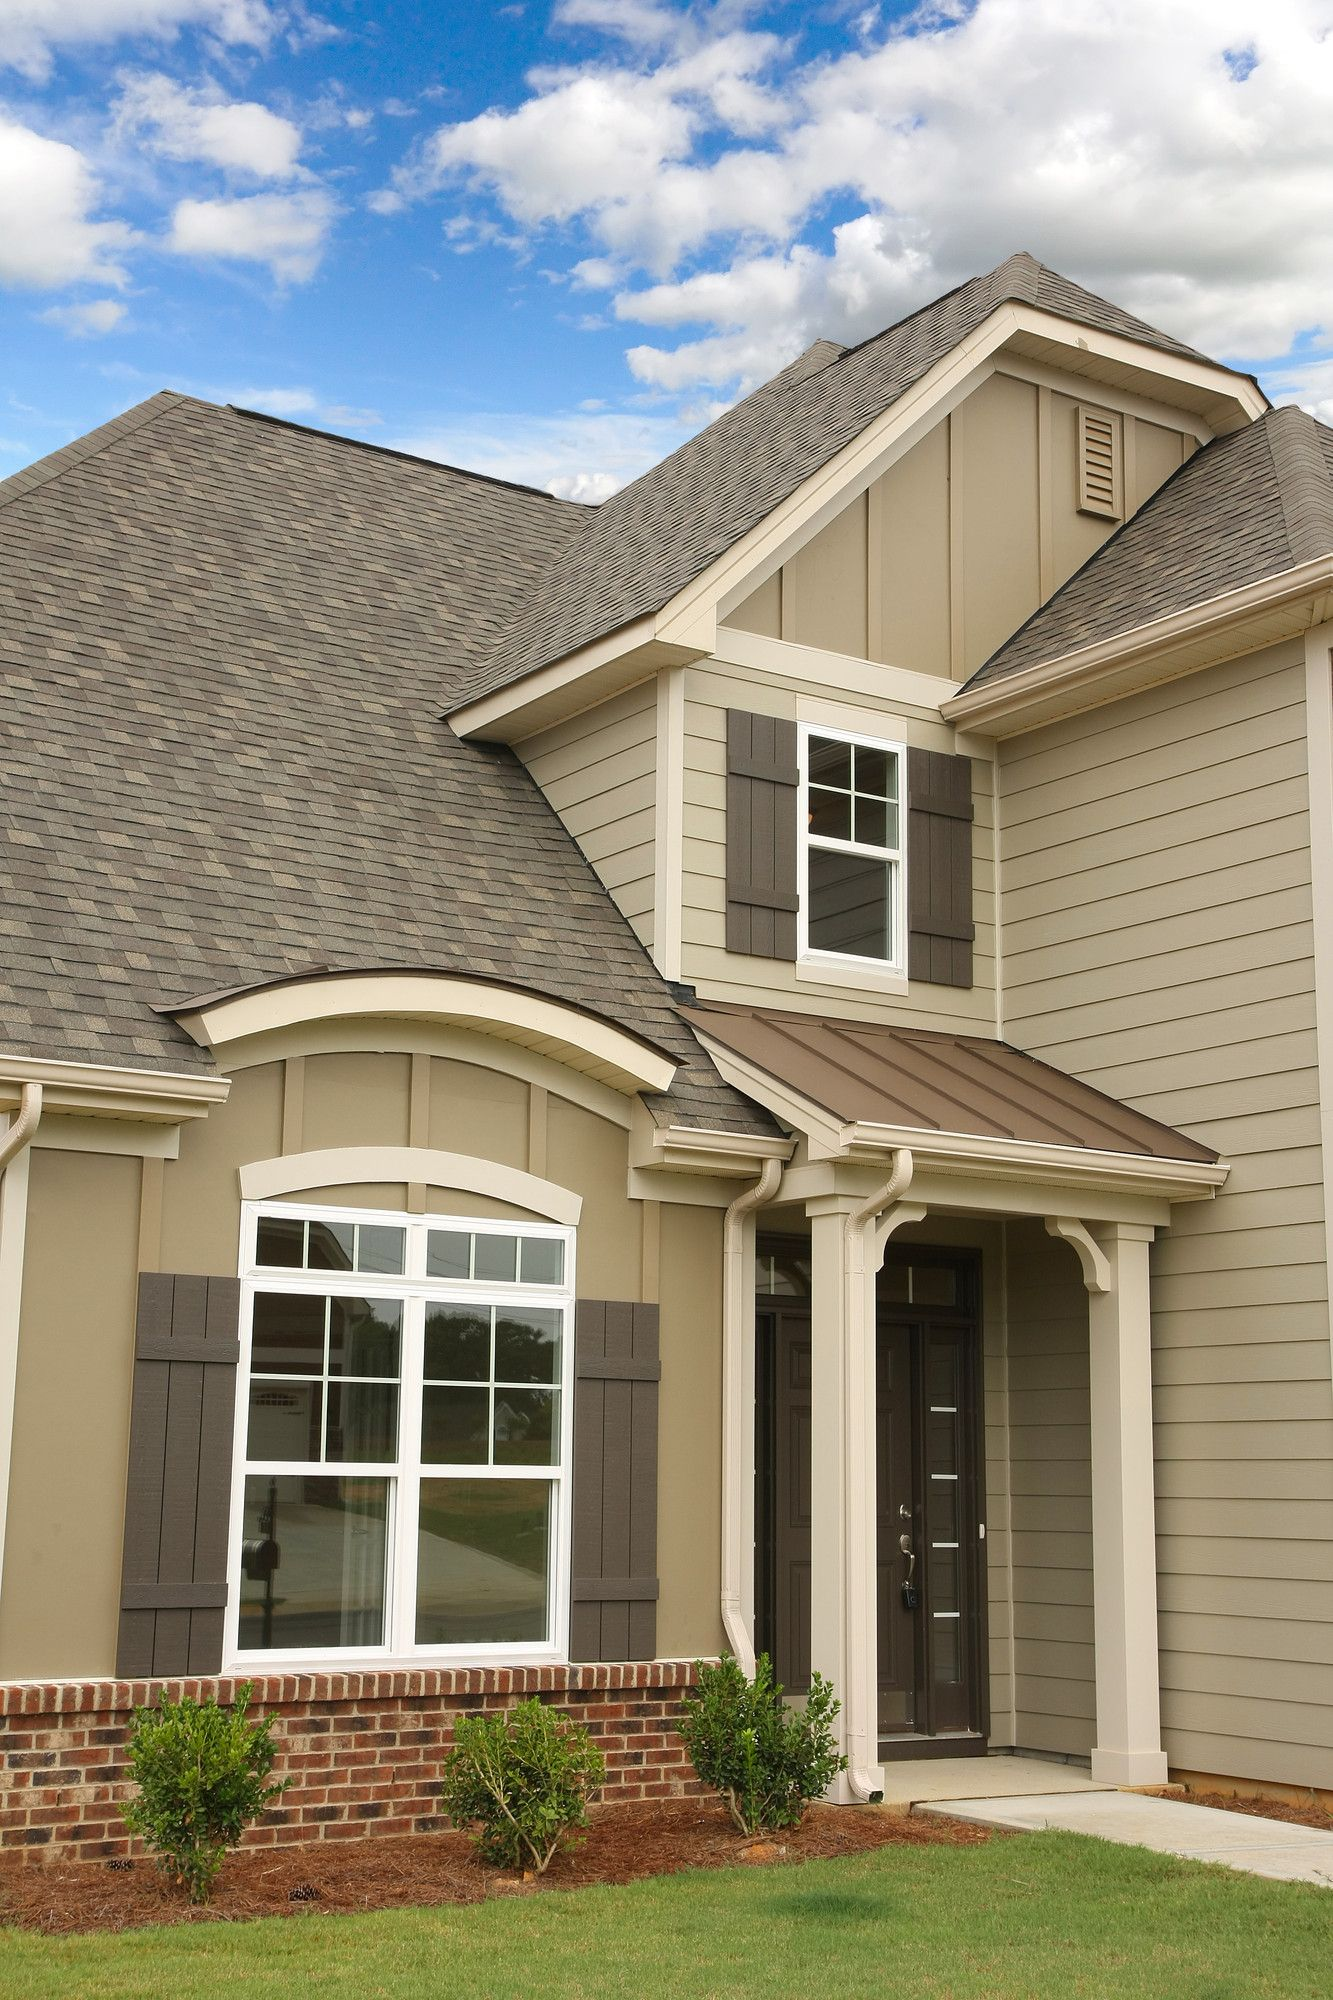 Exterior Home Design Ideas: James Hardie - Design Ideas